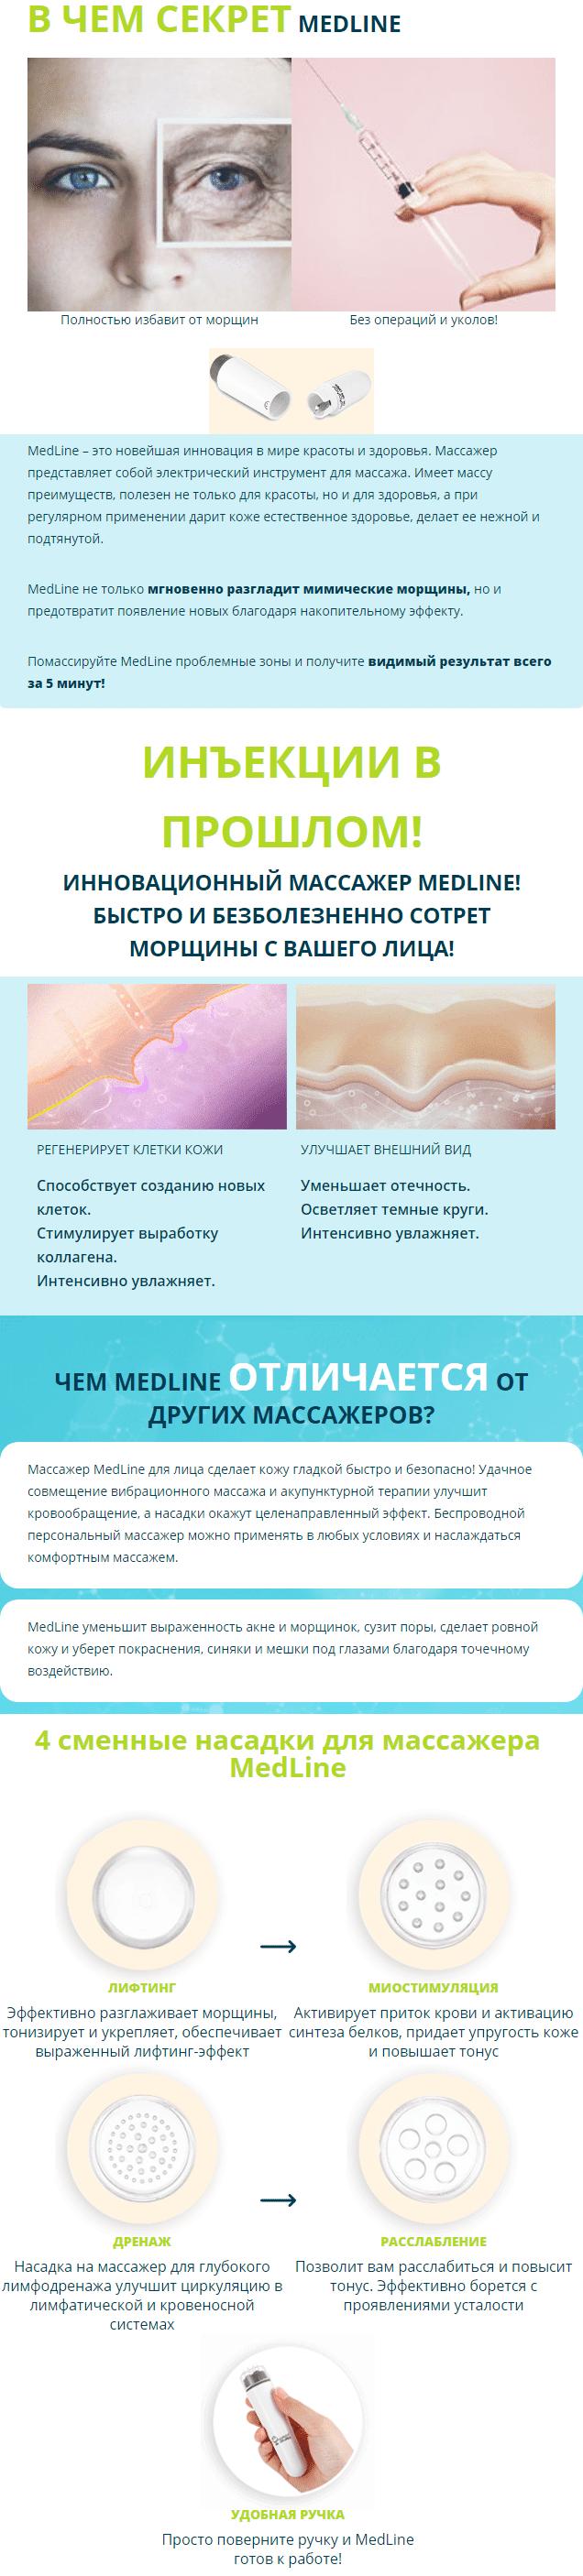 MedLine - массажёр для лица купить